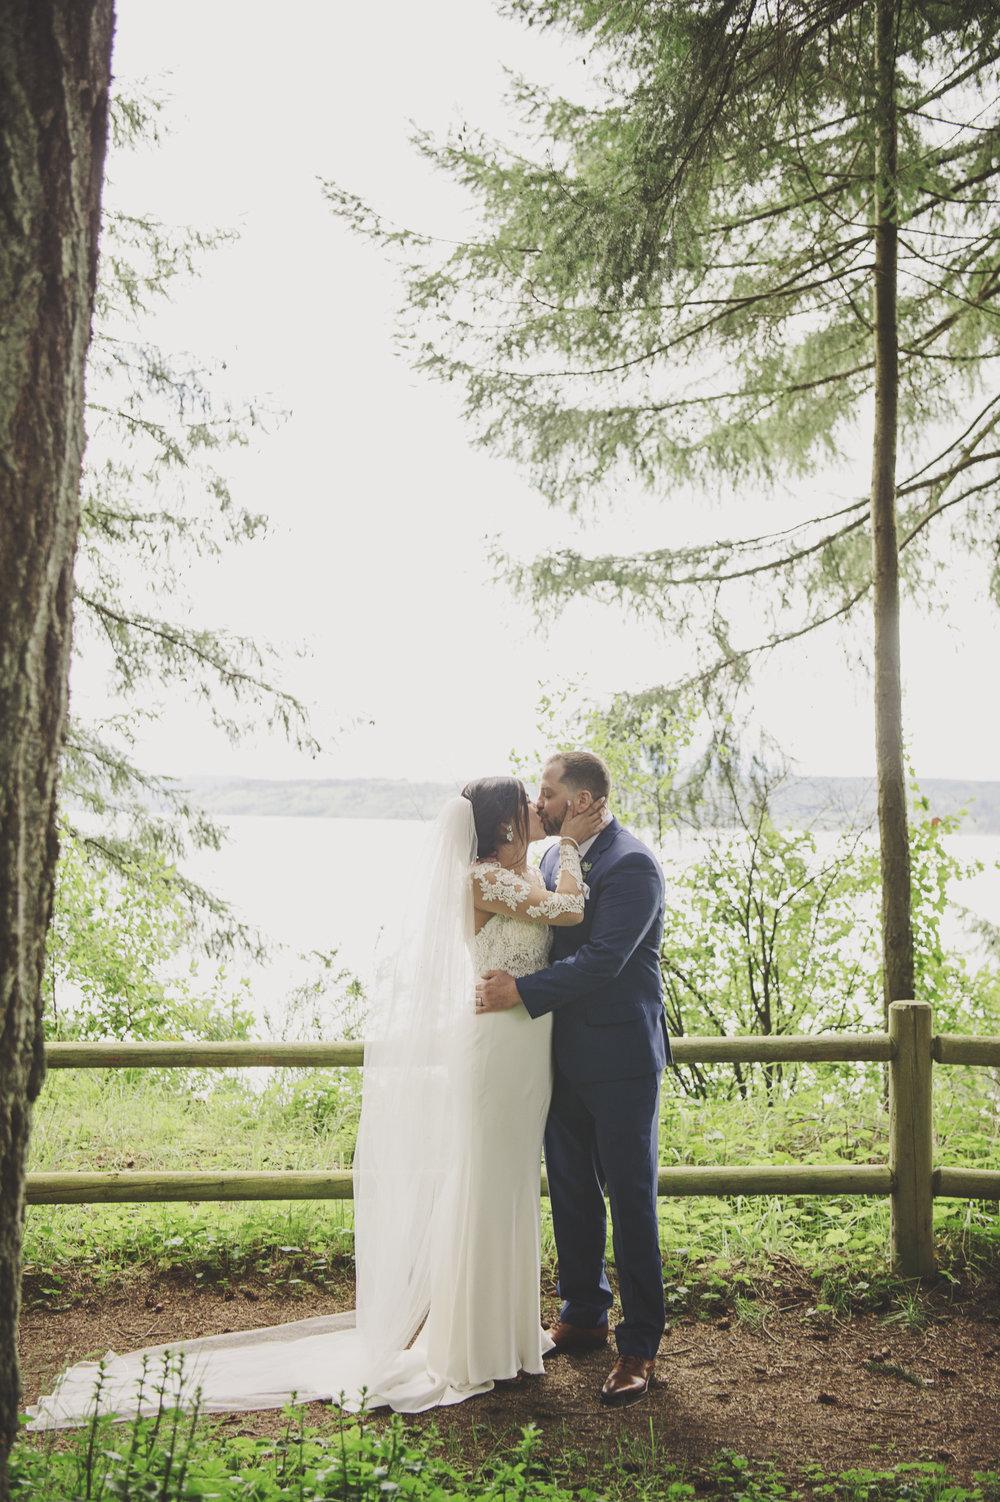 Woodsy Wedding_Kitsap Memorial State Park_Kelsey Lane Photography_4